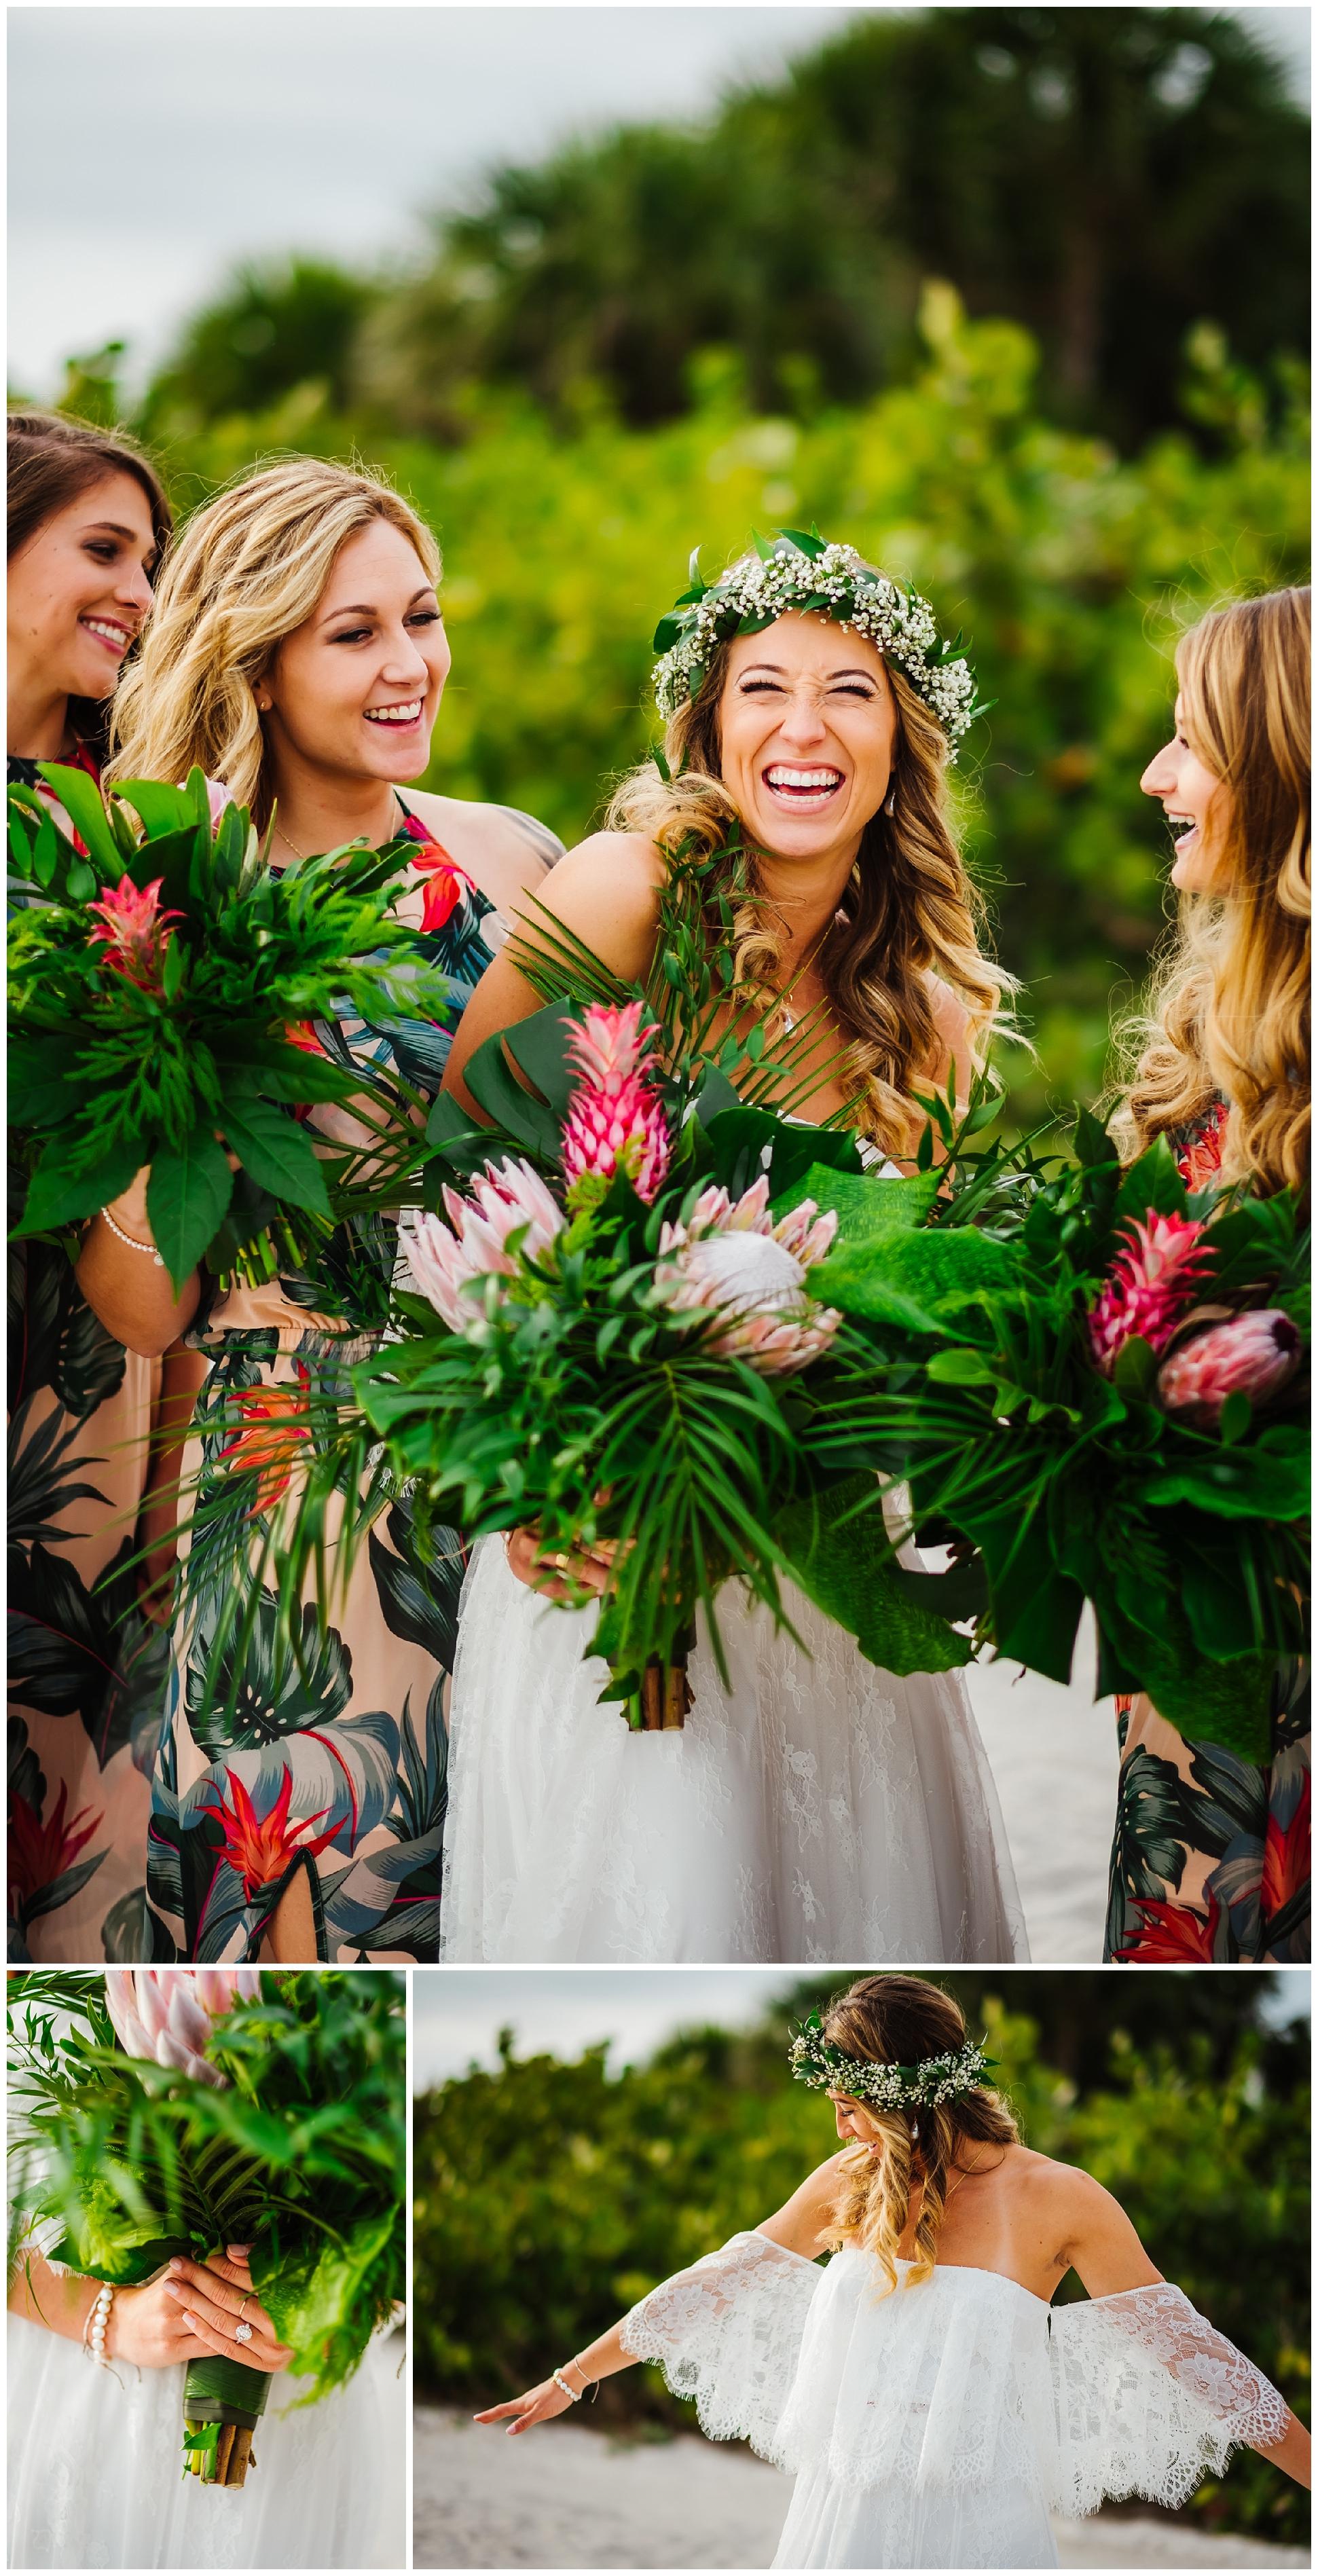 tampa-bay-wedding-photographer-barefoot-post-card-inn-tropical-hawaiin-lei-pink-pineapples-flower-crown_0153.jpg